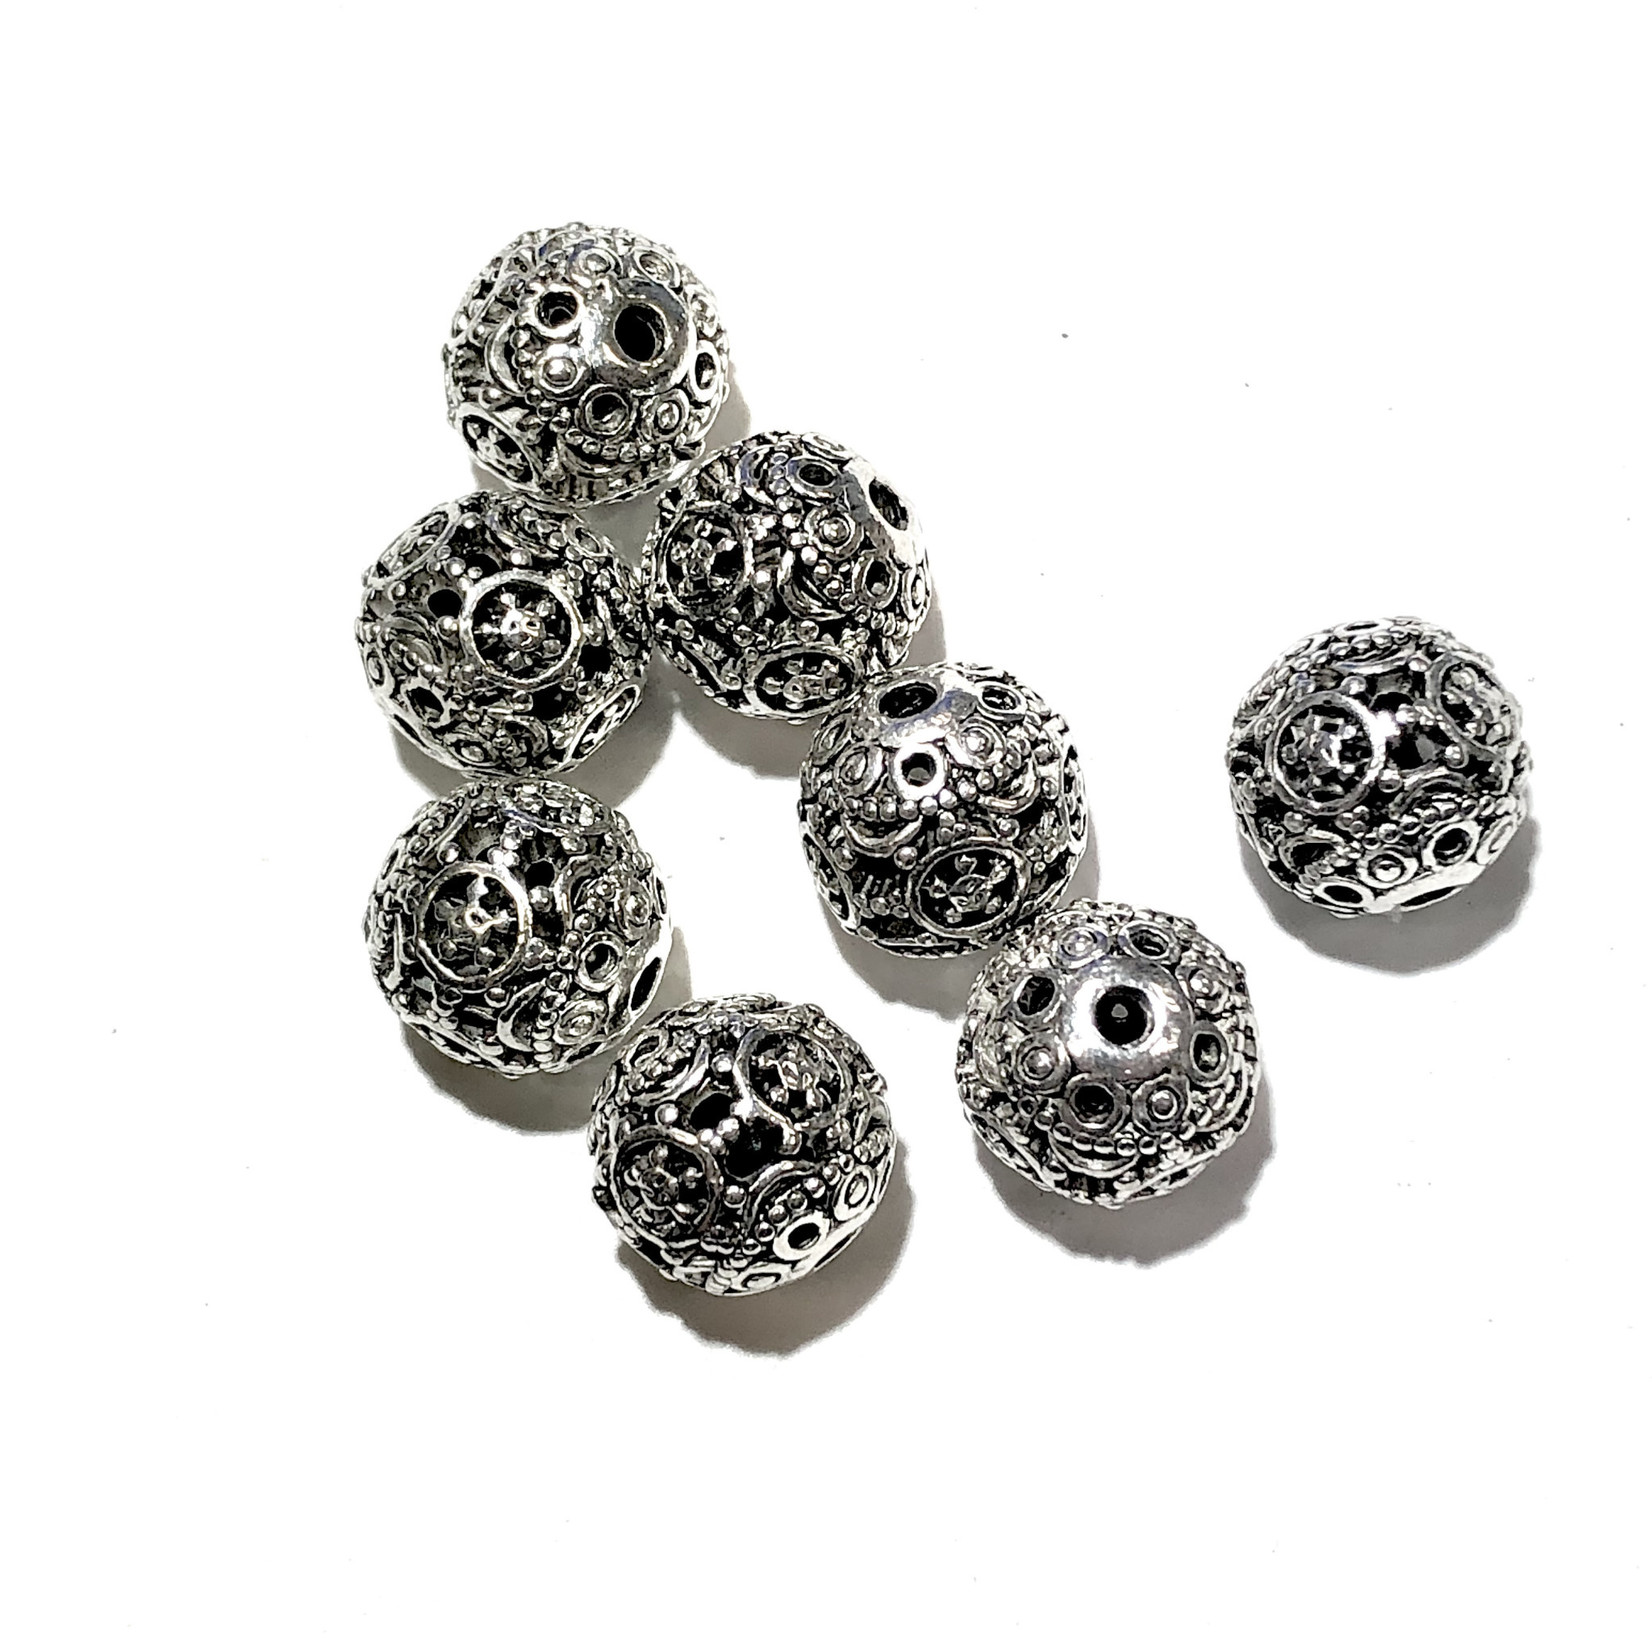 Antique Silver Alloy Decorative Bead 11mm 8pcs